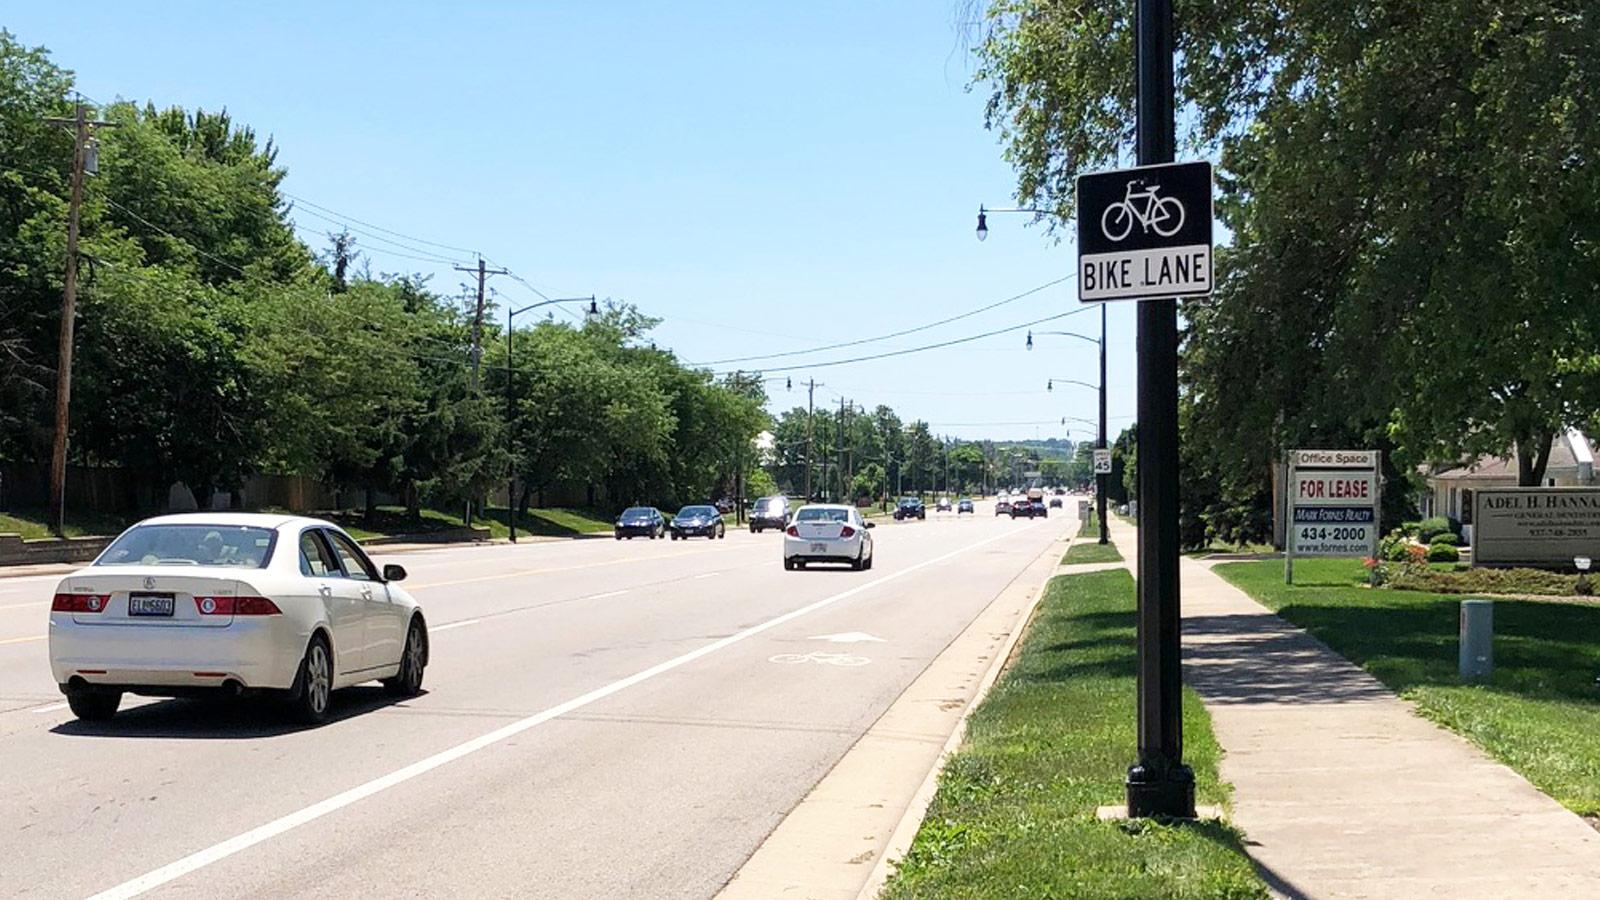 Bike Lane/Shared Lane Delineation